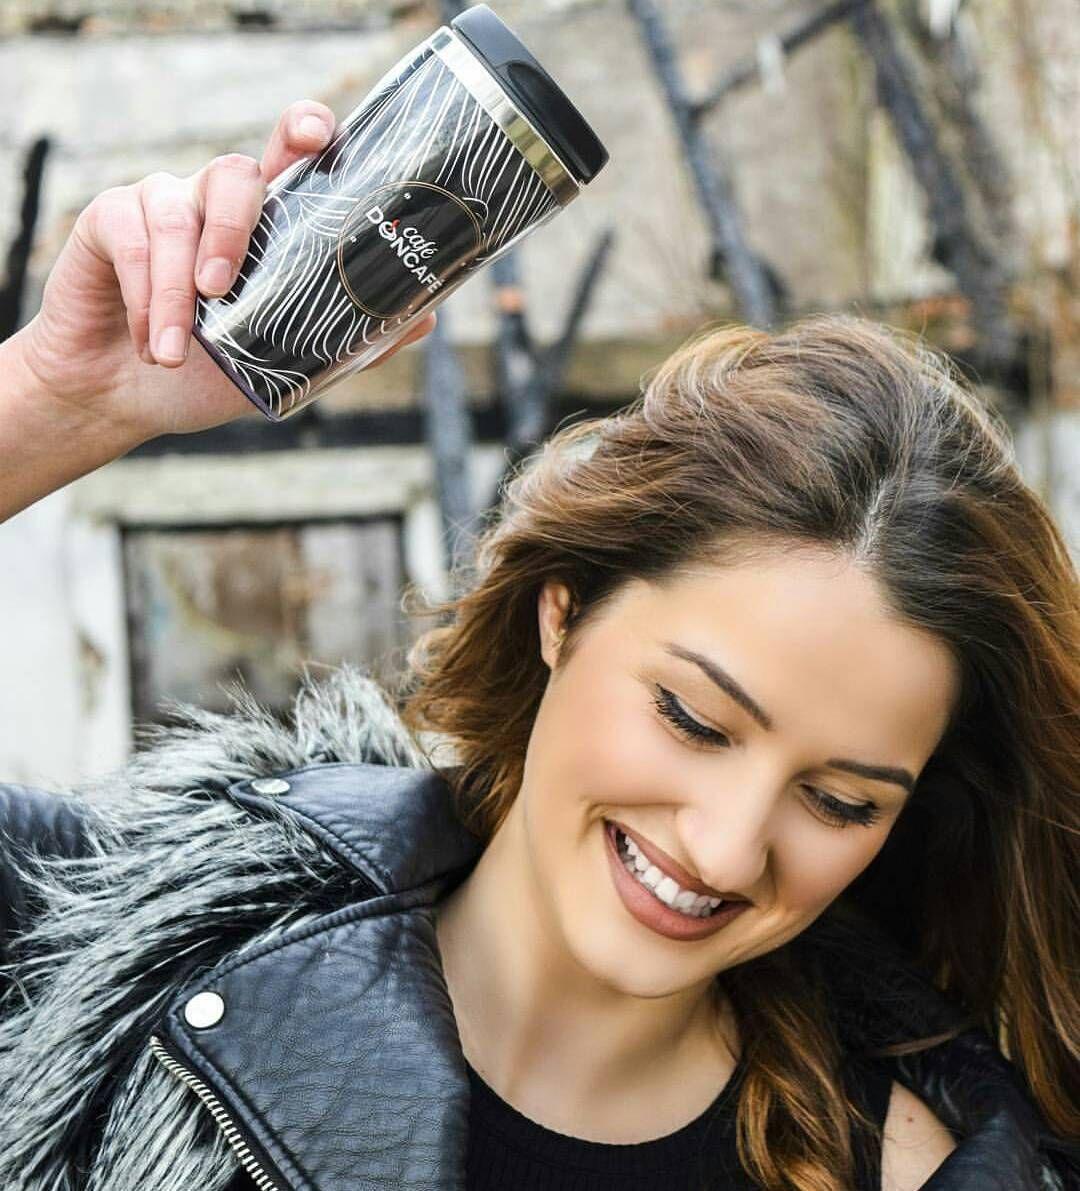 #repost @milarsi  #happyfriday #coffeelovers  #coffeeeverywhere #coffeetimeallthetime  #doncafetermos #cafedoncafe #takeawaycoffee #thingsaboutcoffee #coffeeandseasons #belgradecoffee #womenandcoffee #doncafeprofessionalespresso #doncafe #coffeelove #CoffeeThermos #coffeecupsoftheworld #butfirstcoffee #womanandcoffee by cafedoncafe